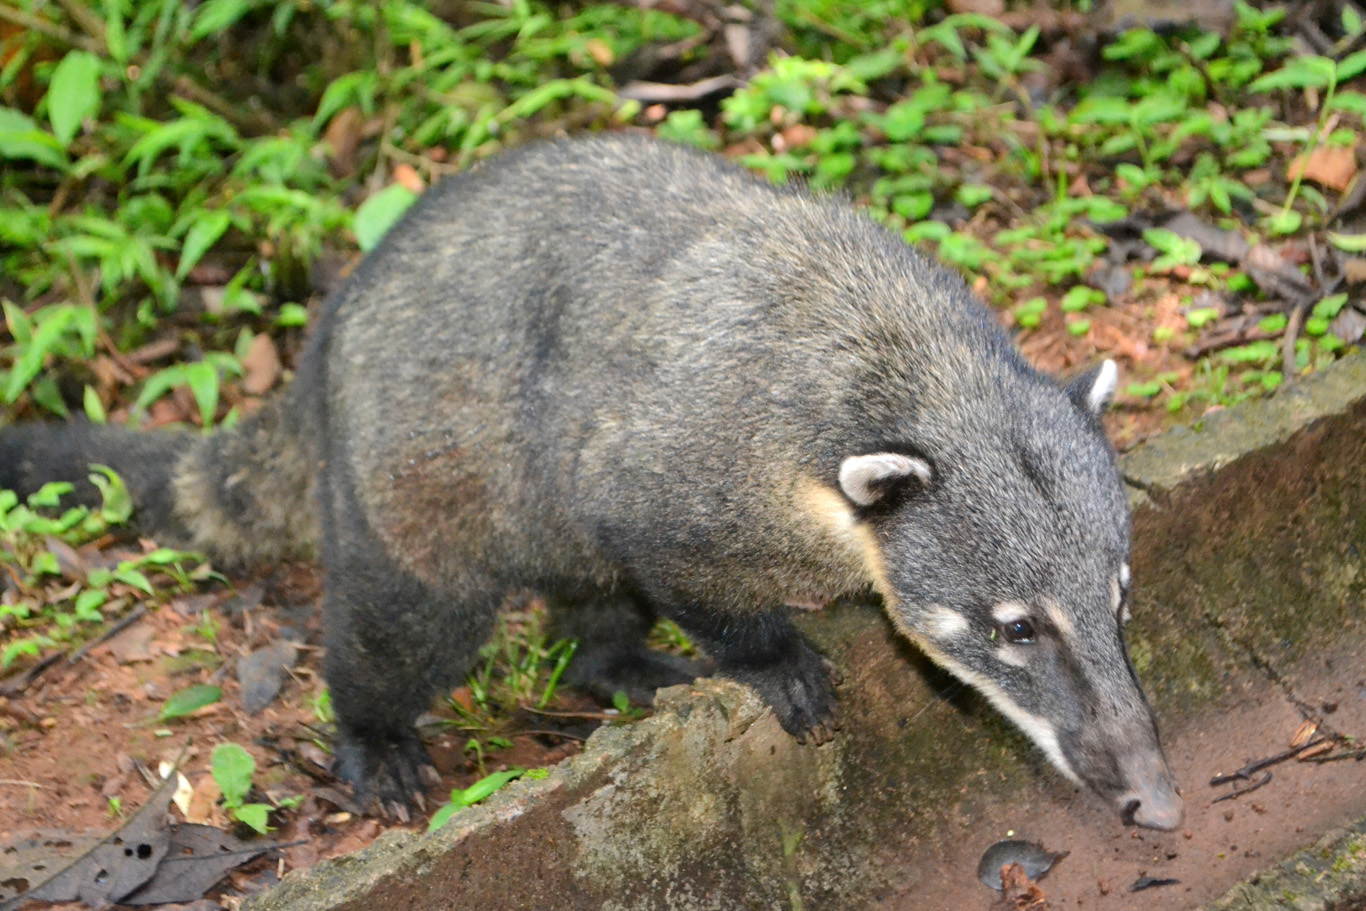 Hungry coati